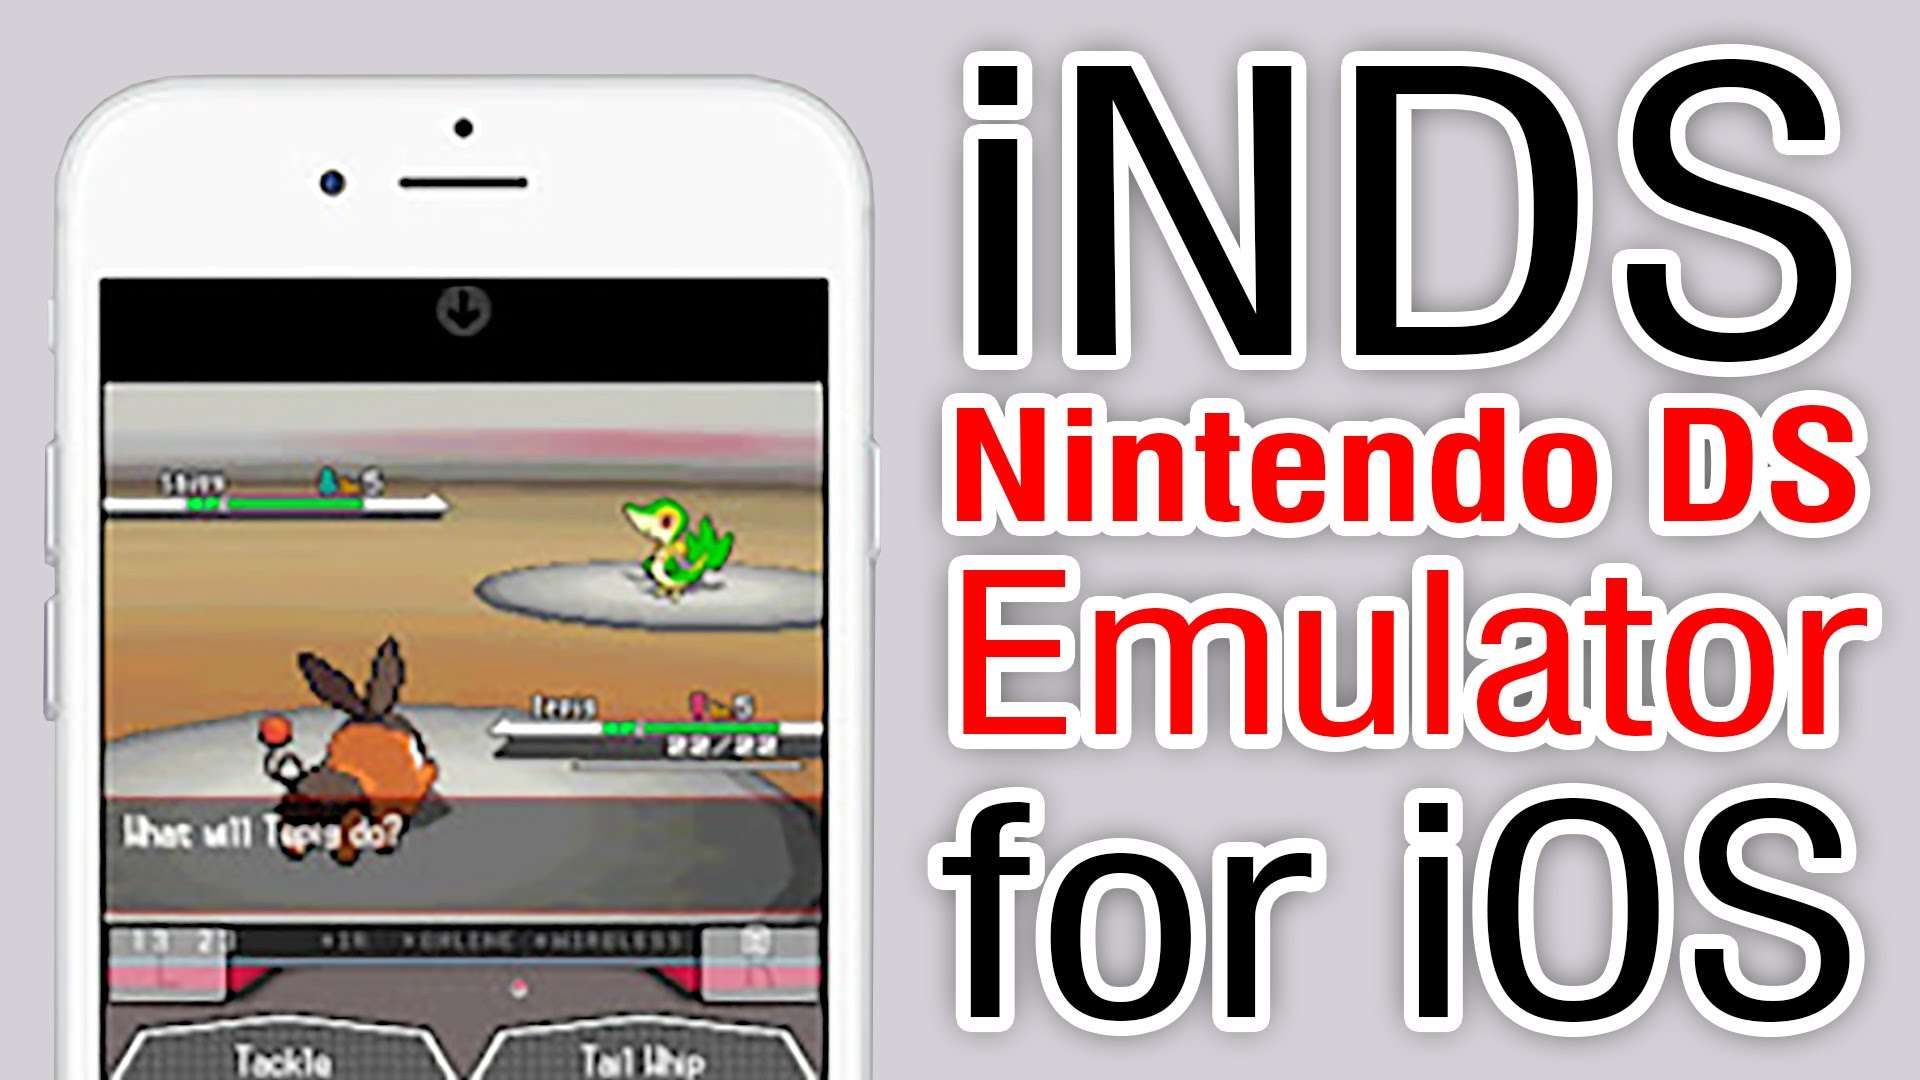 Best Nintendo DS Emulators for iPhone/iPad on iOS 10 (Without Jailbreak)